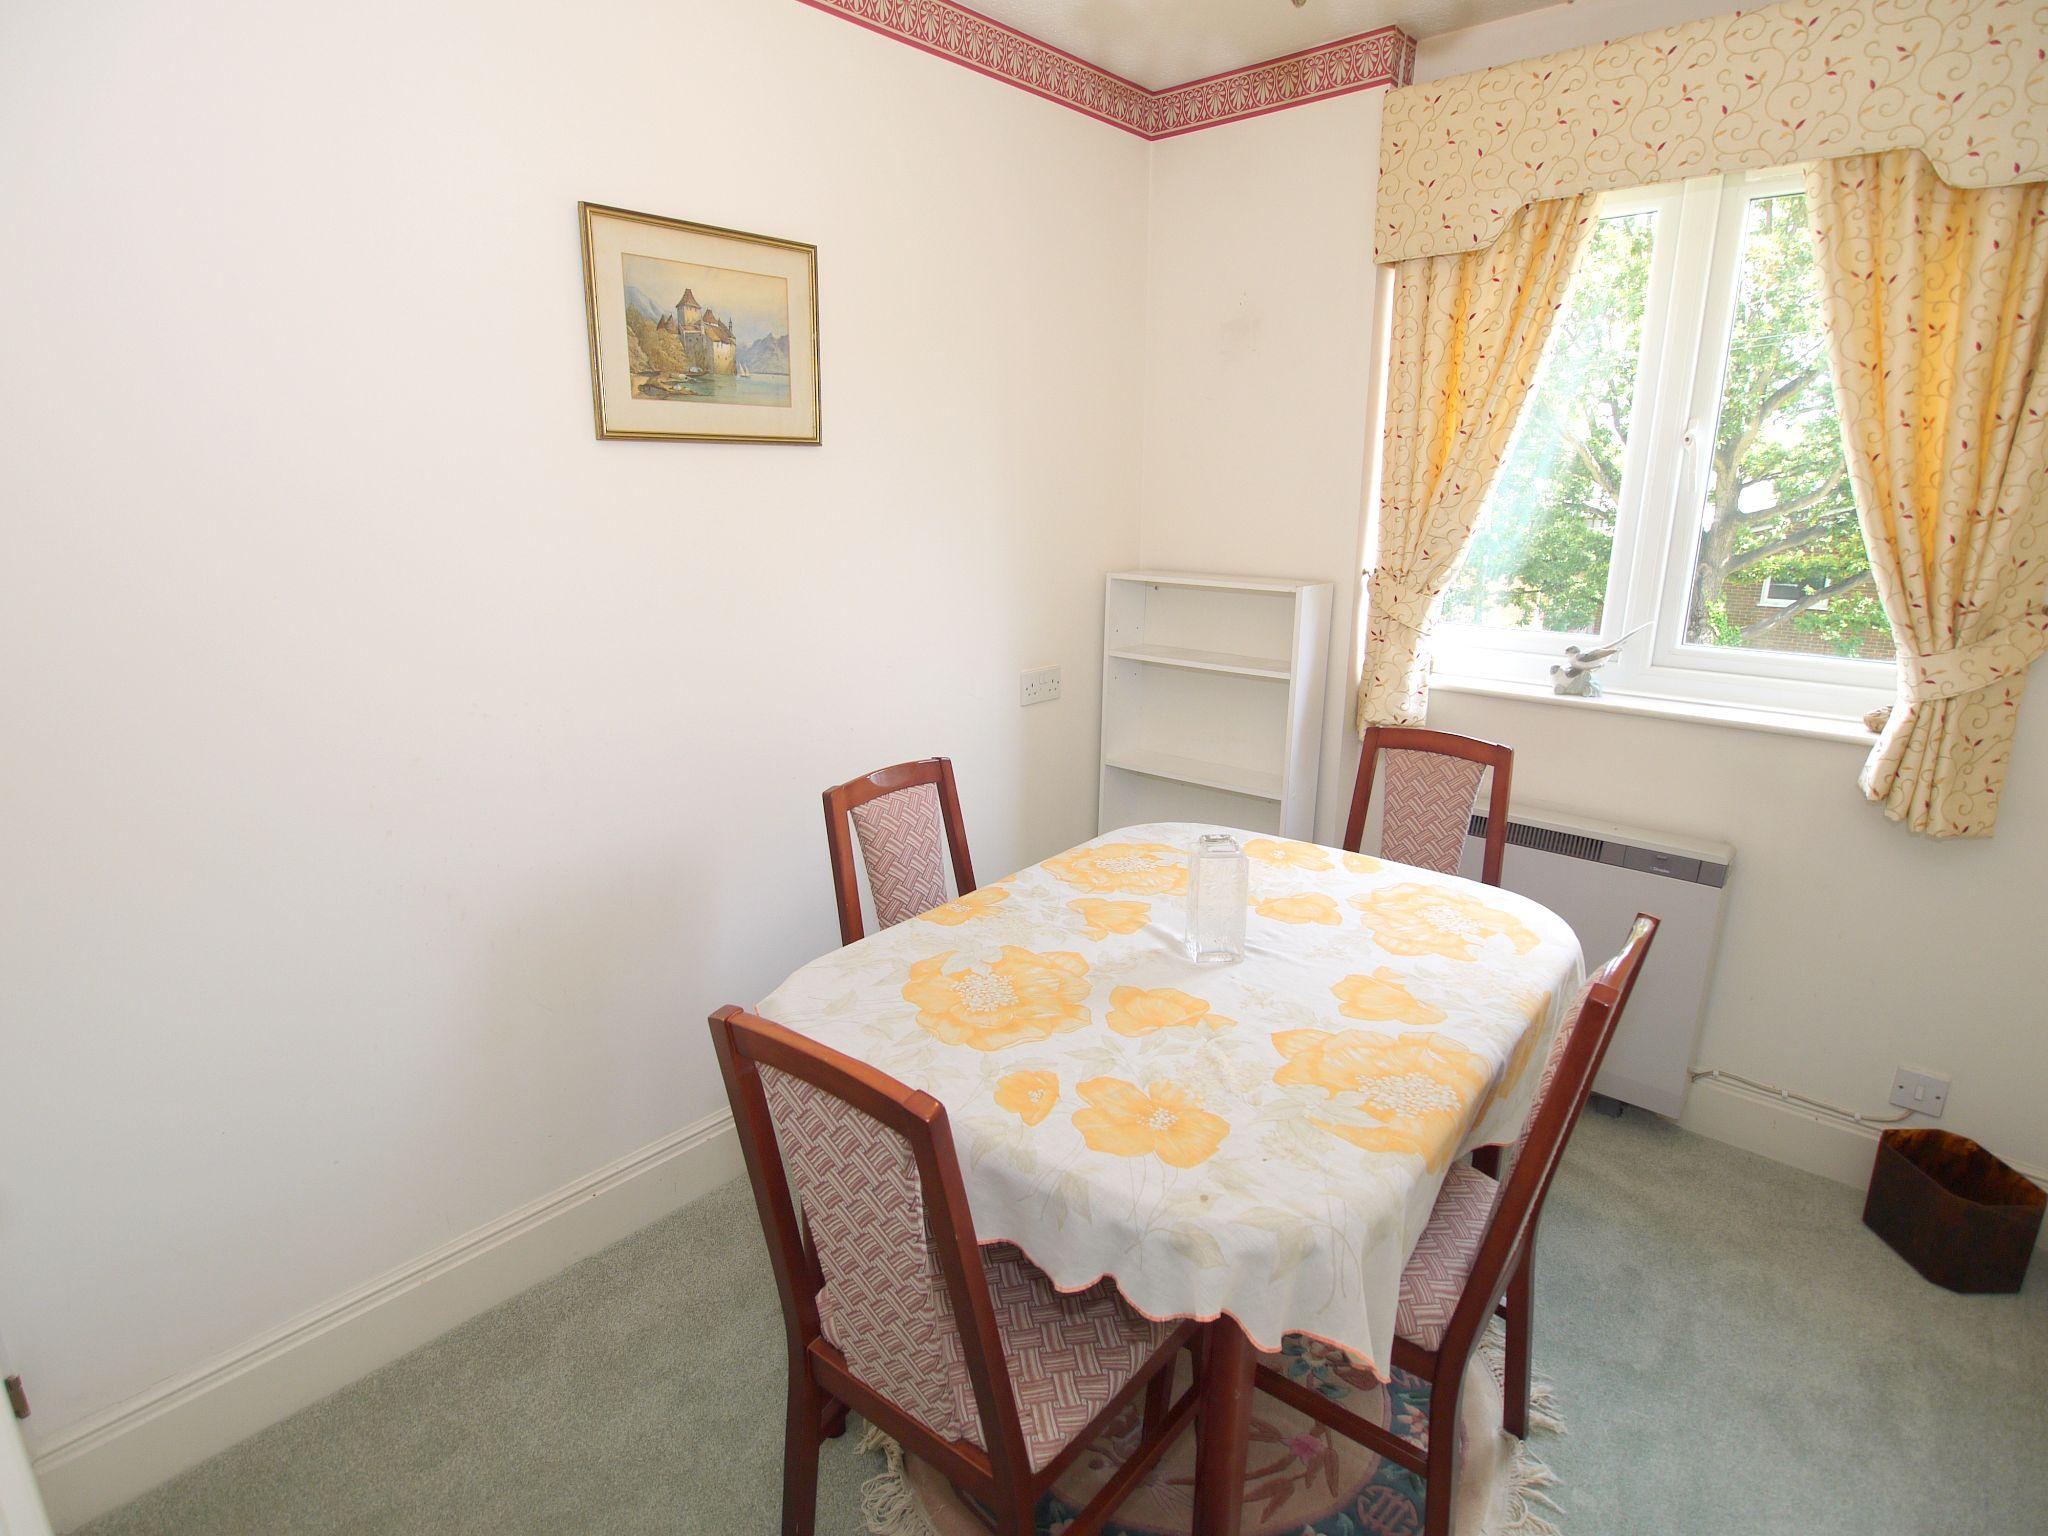 2 bedroom apartment For Sale in Sevenoaks - Photograph 6